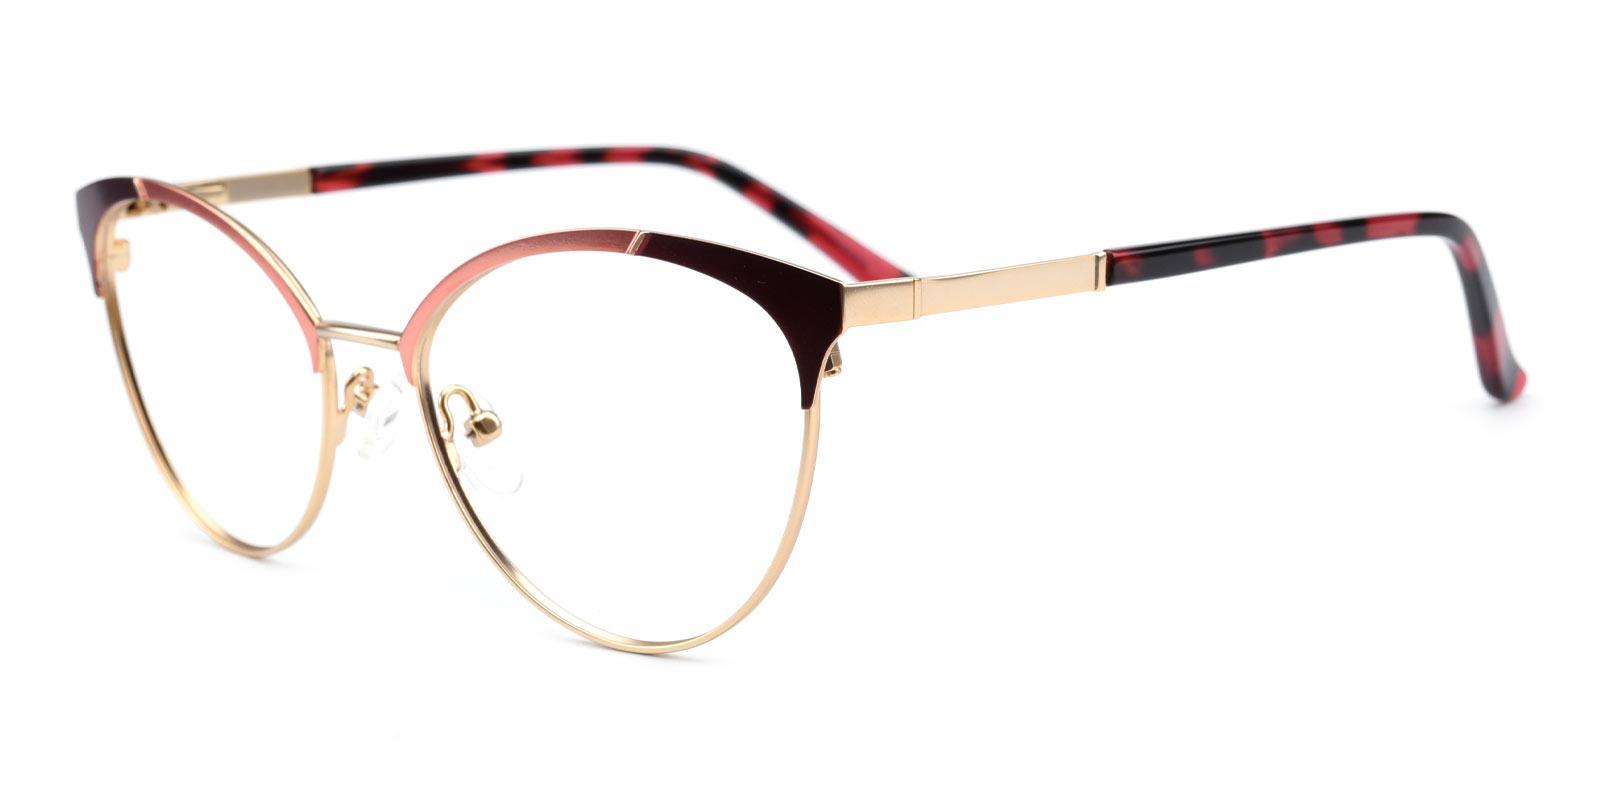 Hobbit-Red-Cat-Metal-Eyeglasses-additional1